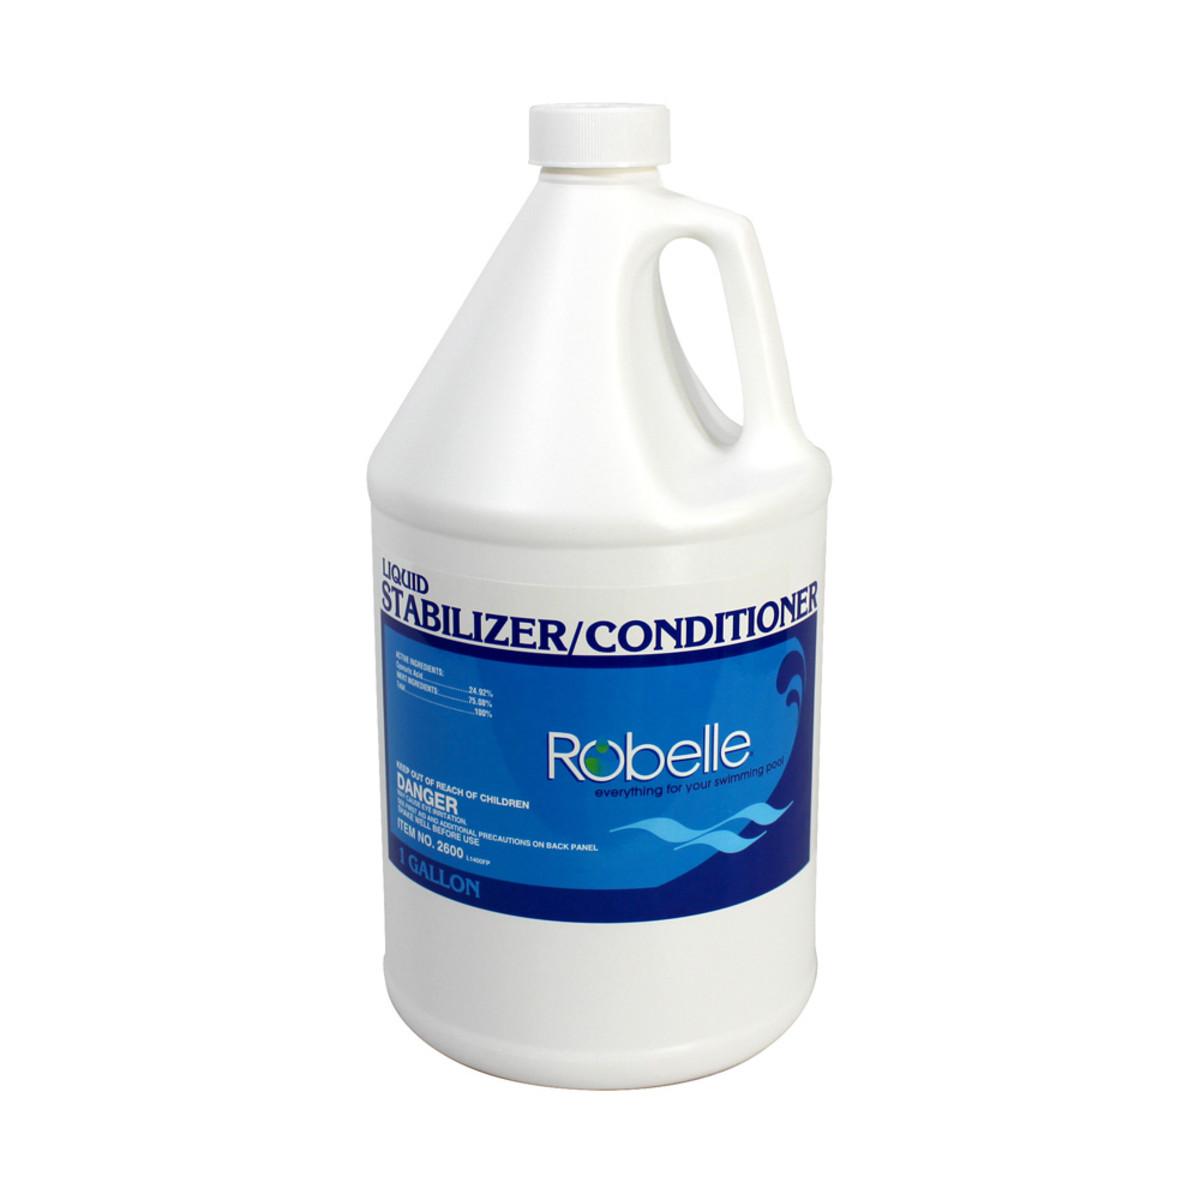 Robelle Liquid Stabilizer Conditioner 1 Gallon Pool Stabilizer Conditioner Splash Super